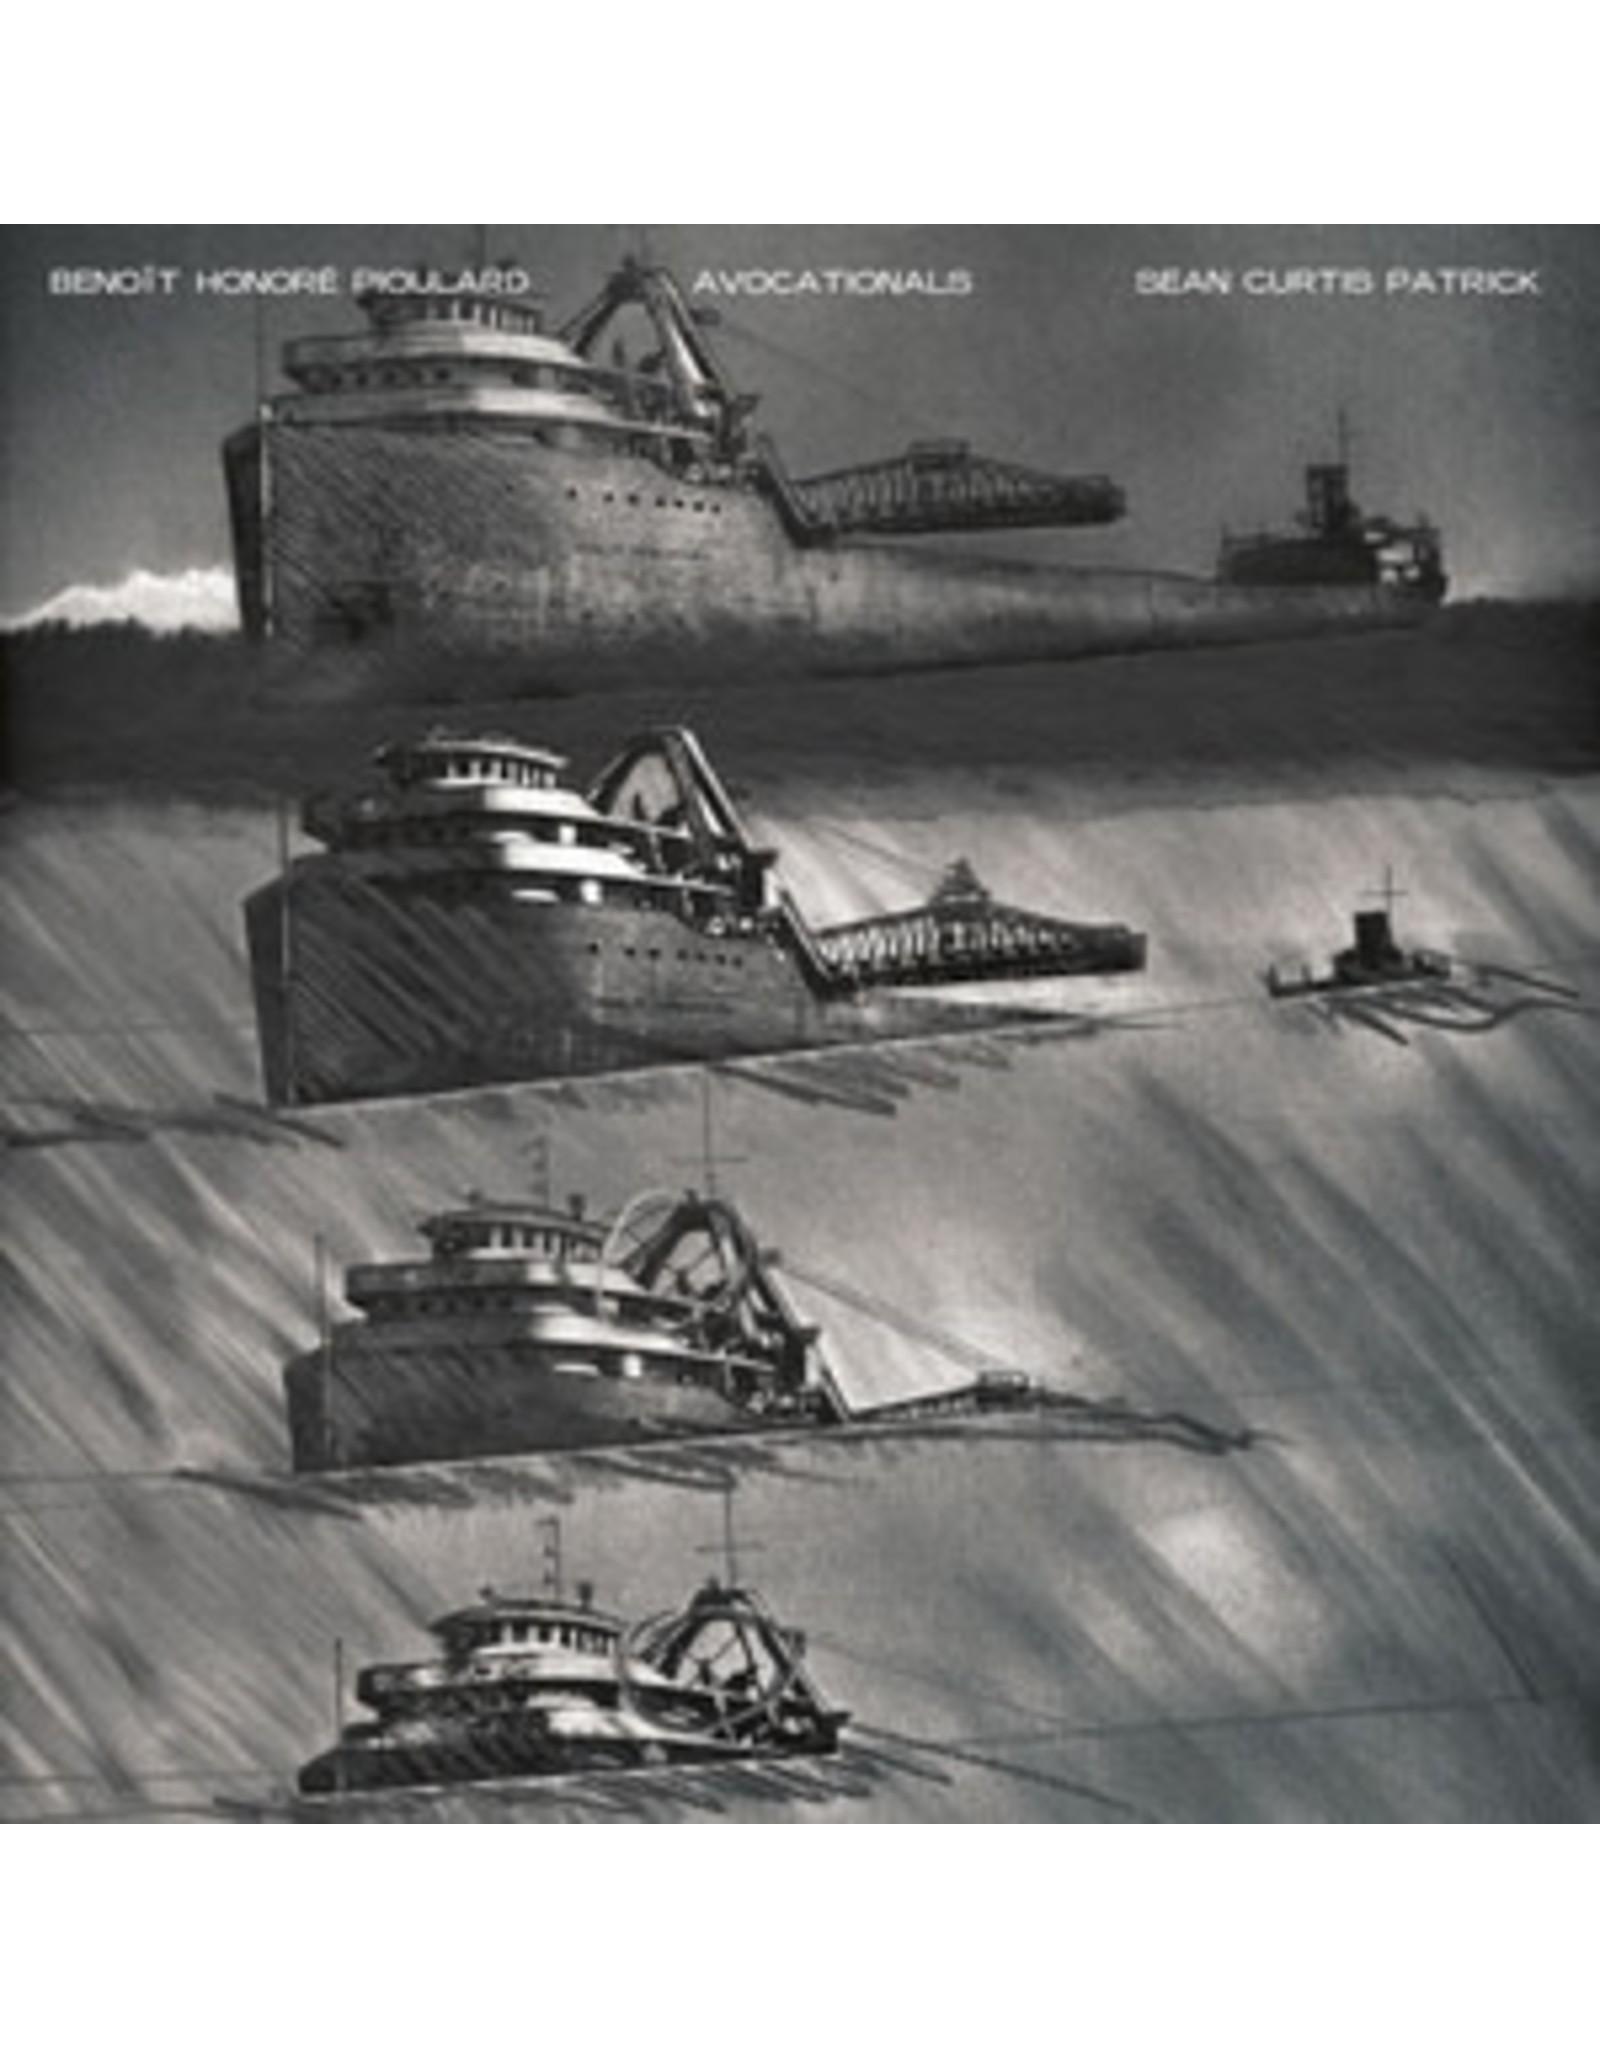 Beacon Sound Pioulard/Patrick: Avocation LP